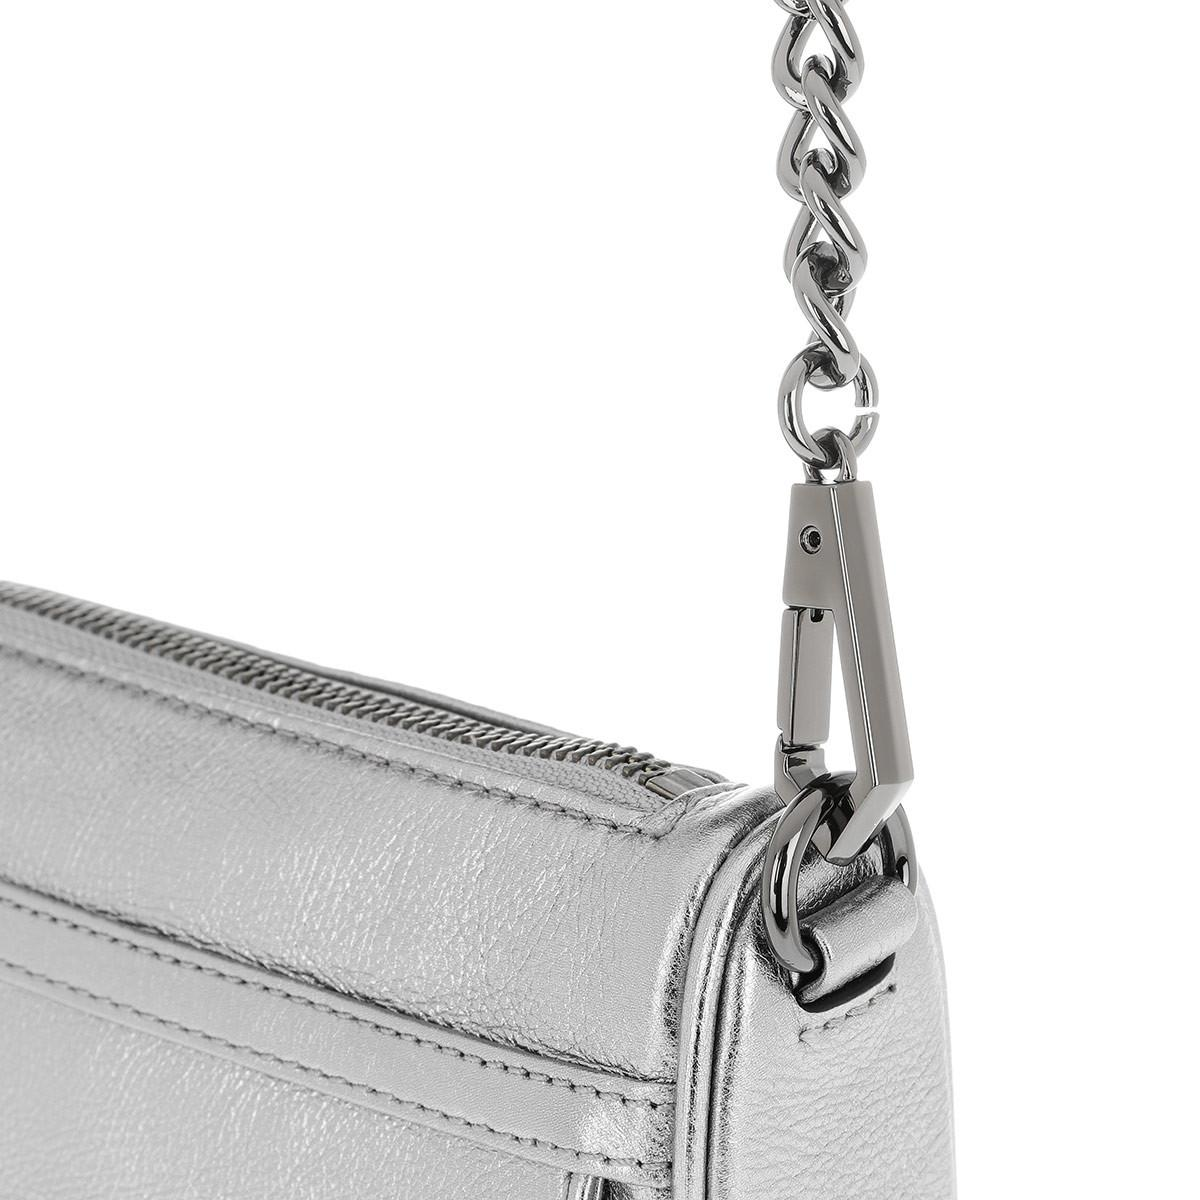 Rebecca Minkoff Leather Mini Mac Chain Crossbody Bag Anthracite in Grey